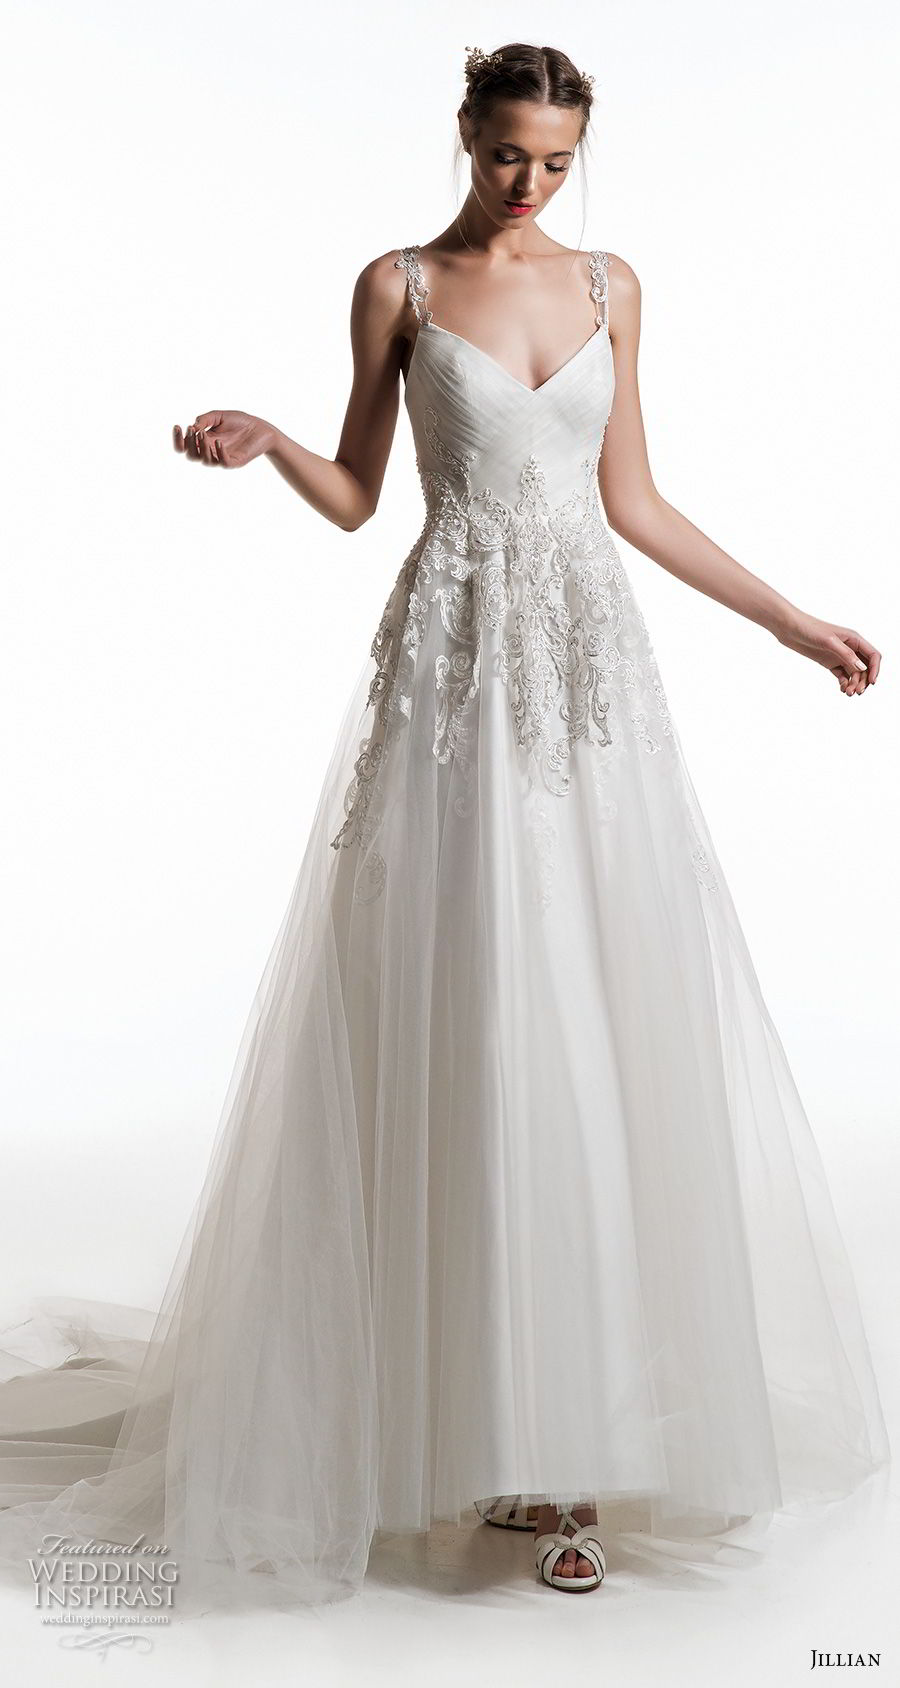 jillian 2019 bridal embellished strap diamond neck heavily embellished bodice romantic a  line wedding dress chapel train (18) mv